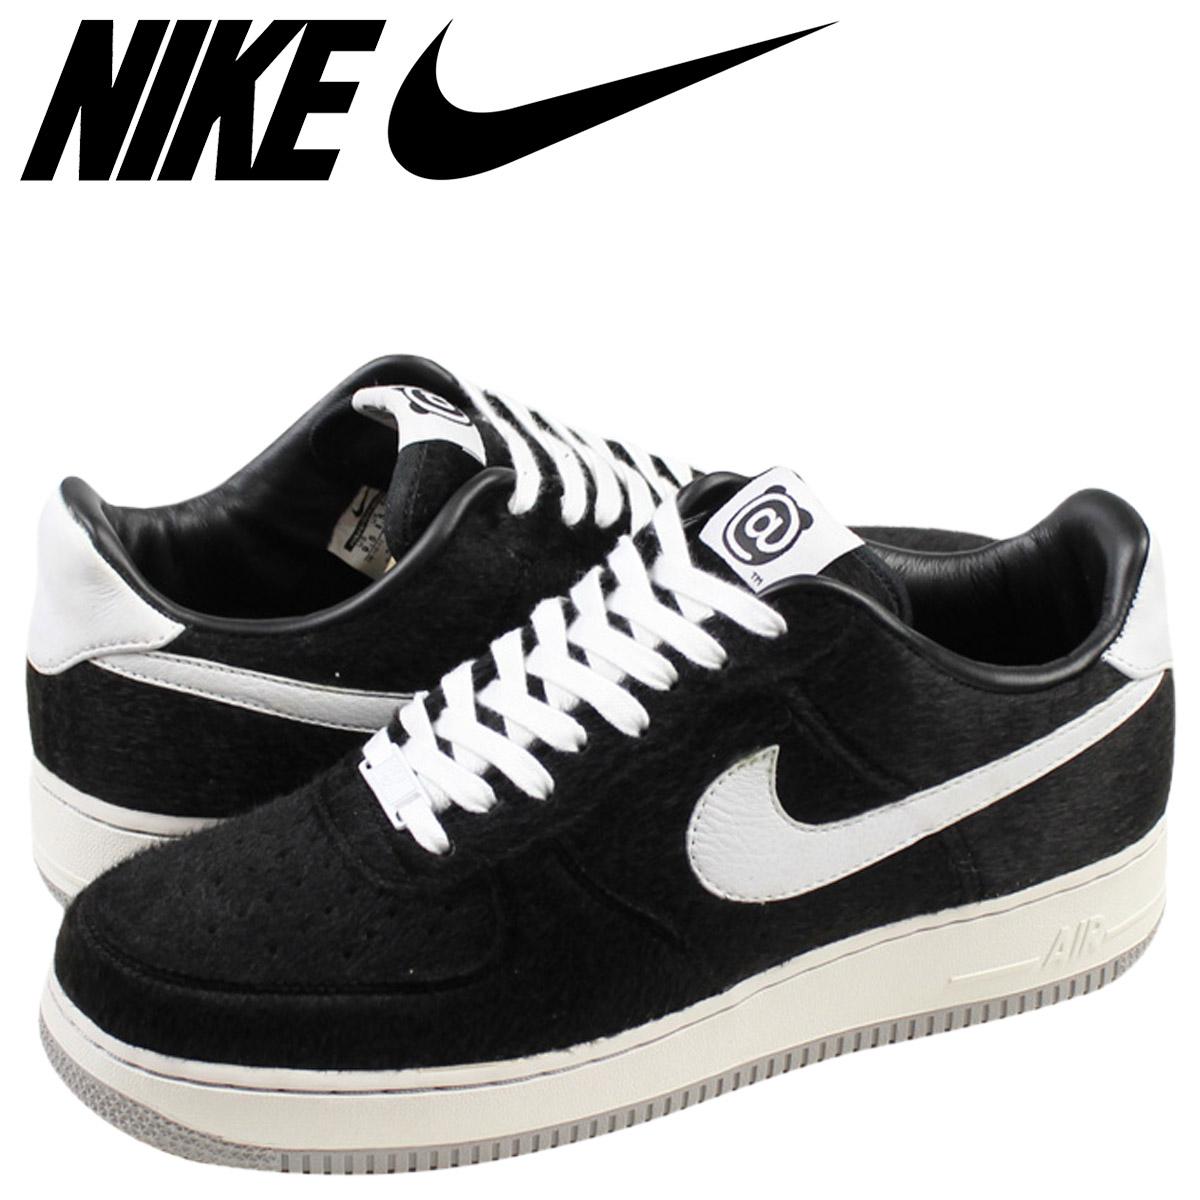 c46a823ca3a4  SOLD OUT  Nike NIKE air force sneakers AIR FORCE 1 LOW PRM TZ BEARBRICK air  Forson low premium be rbrcik MEDICOM 512518-090 black mens